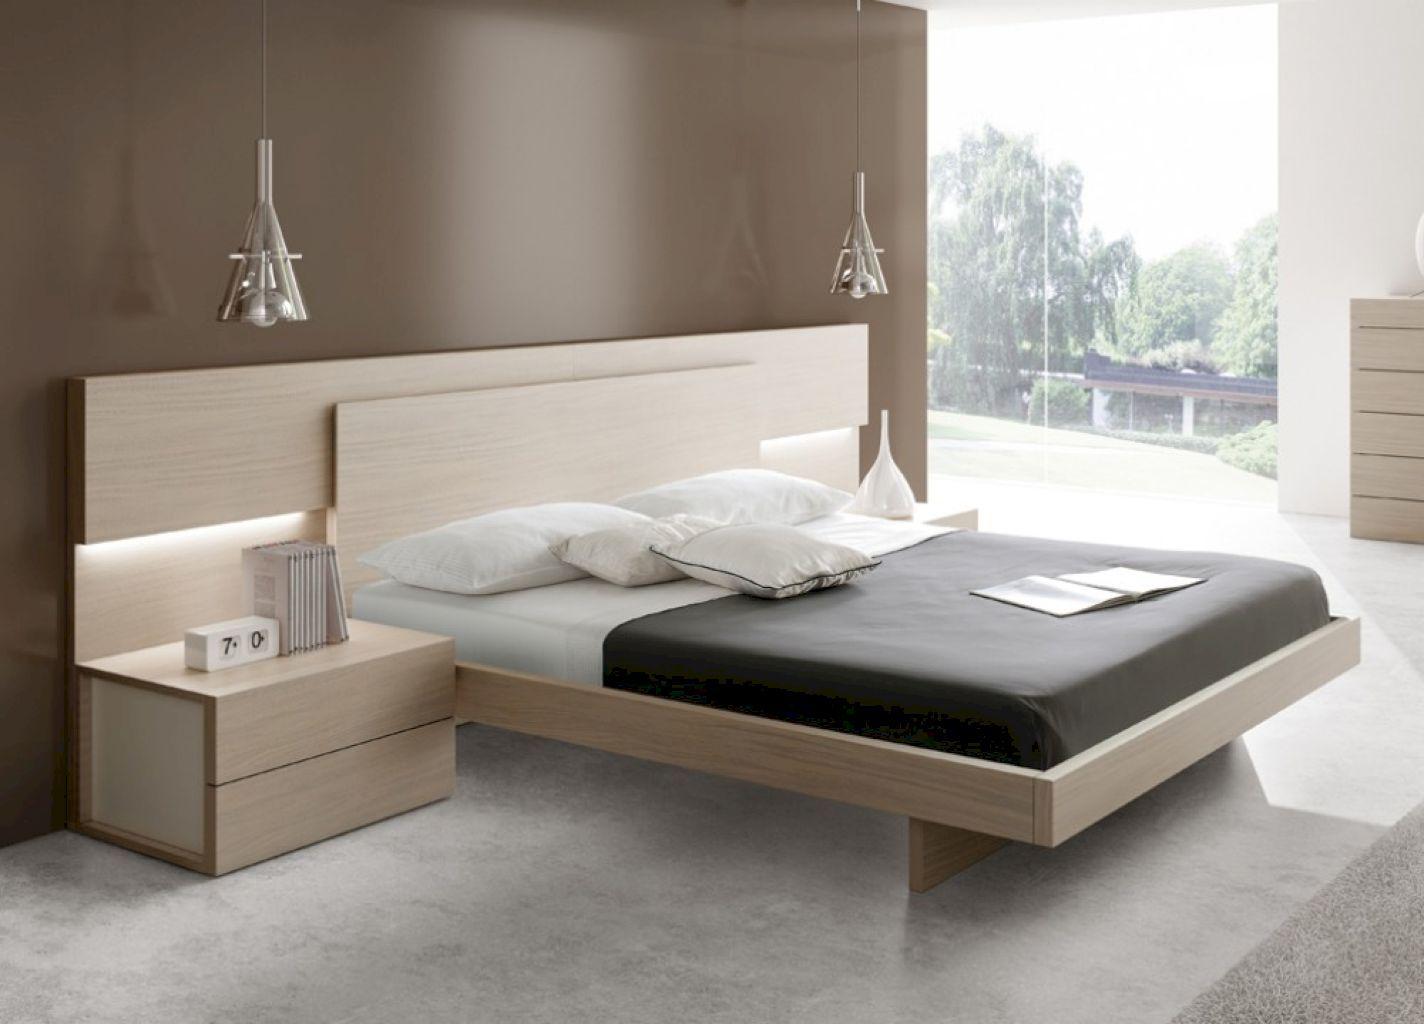 77 comfy bedroom decor ideas - Bedroom Design Ideas 2017